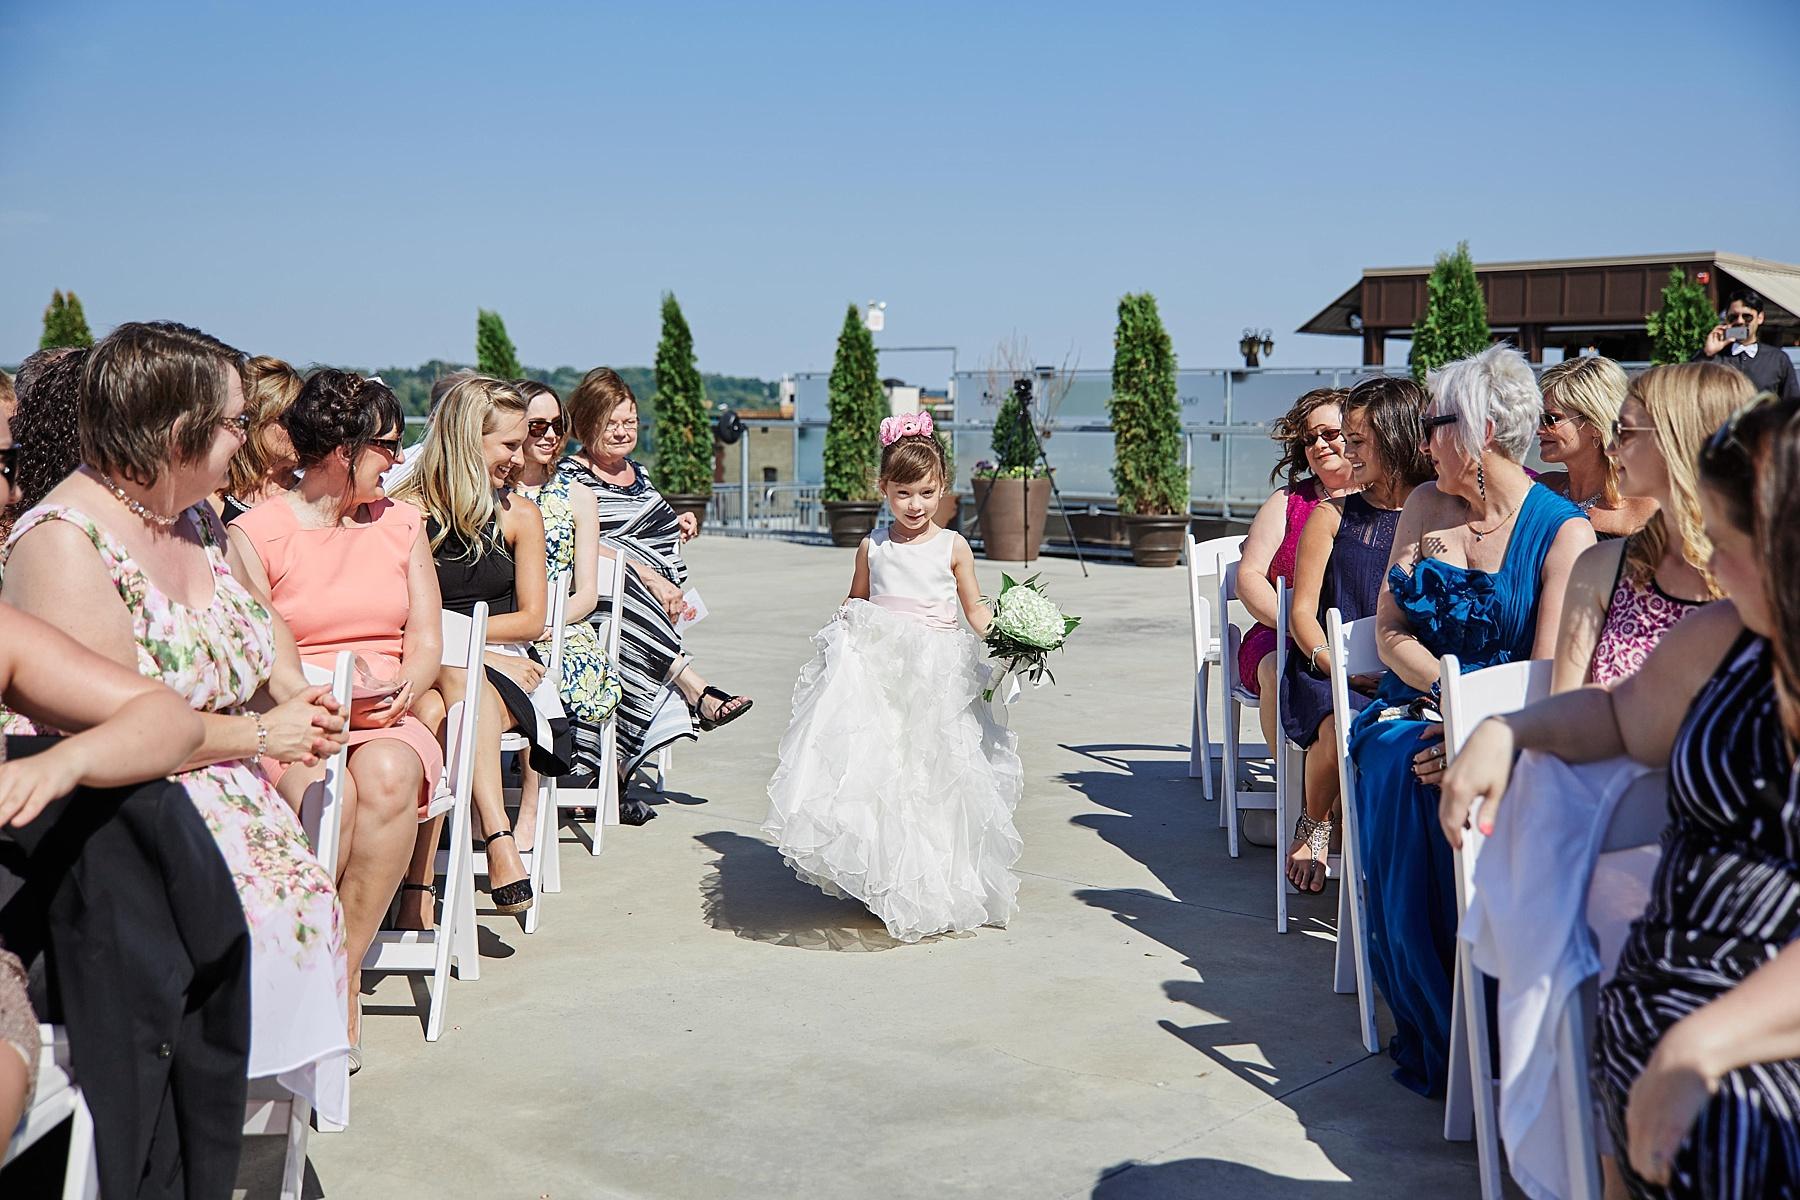 ABULAE-Wedding-Saint-paul-MN-Josh-Sofia-Wedding-Mears-Park_0747.jpg